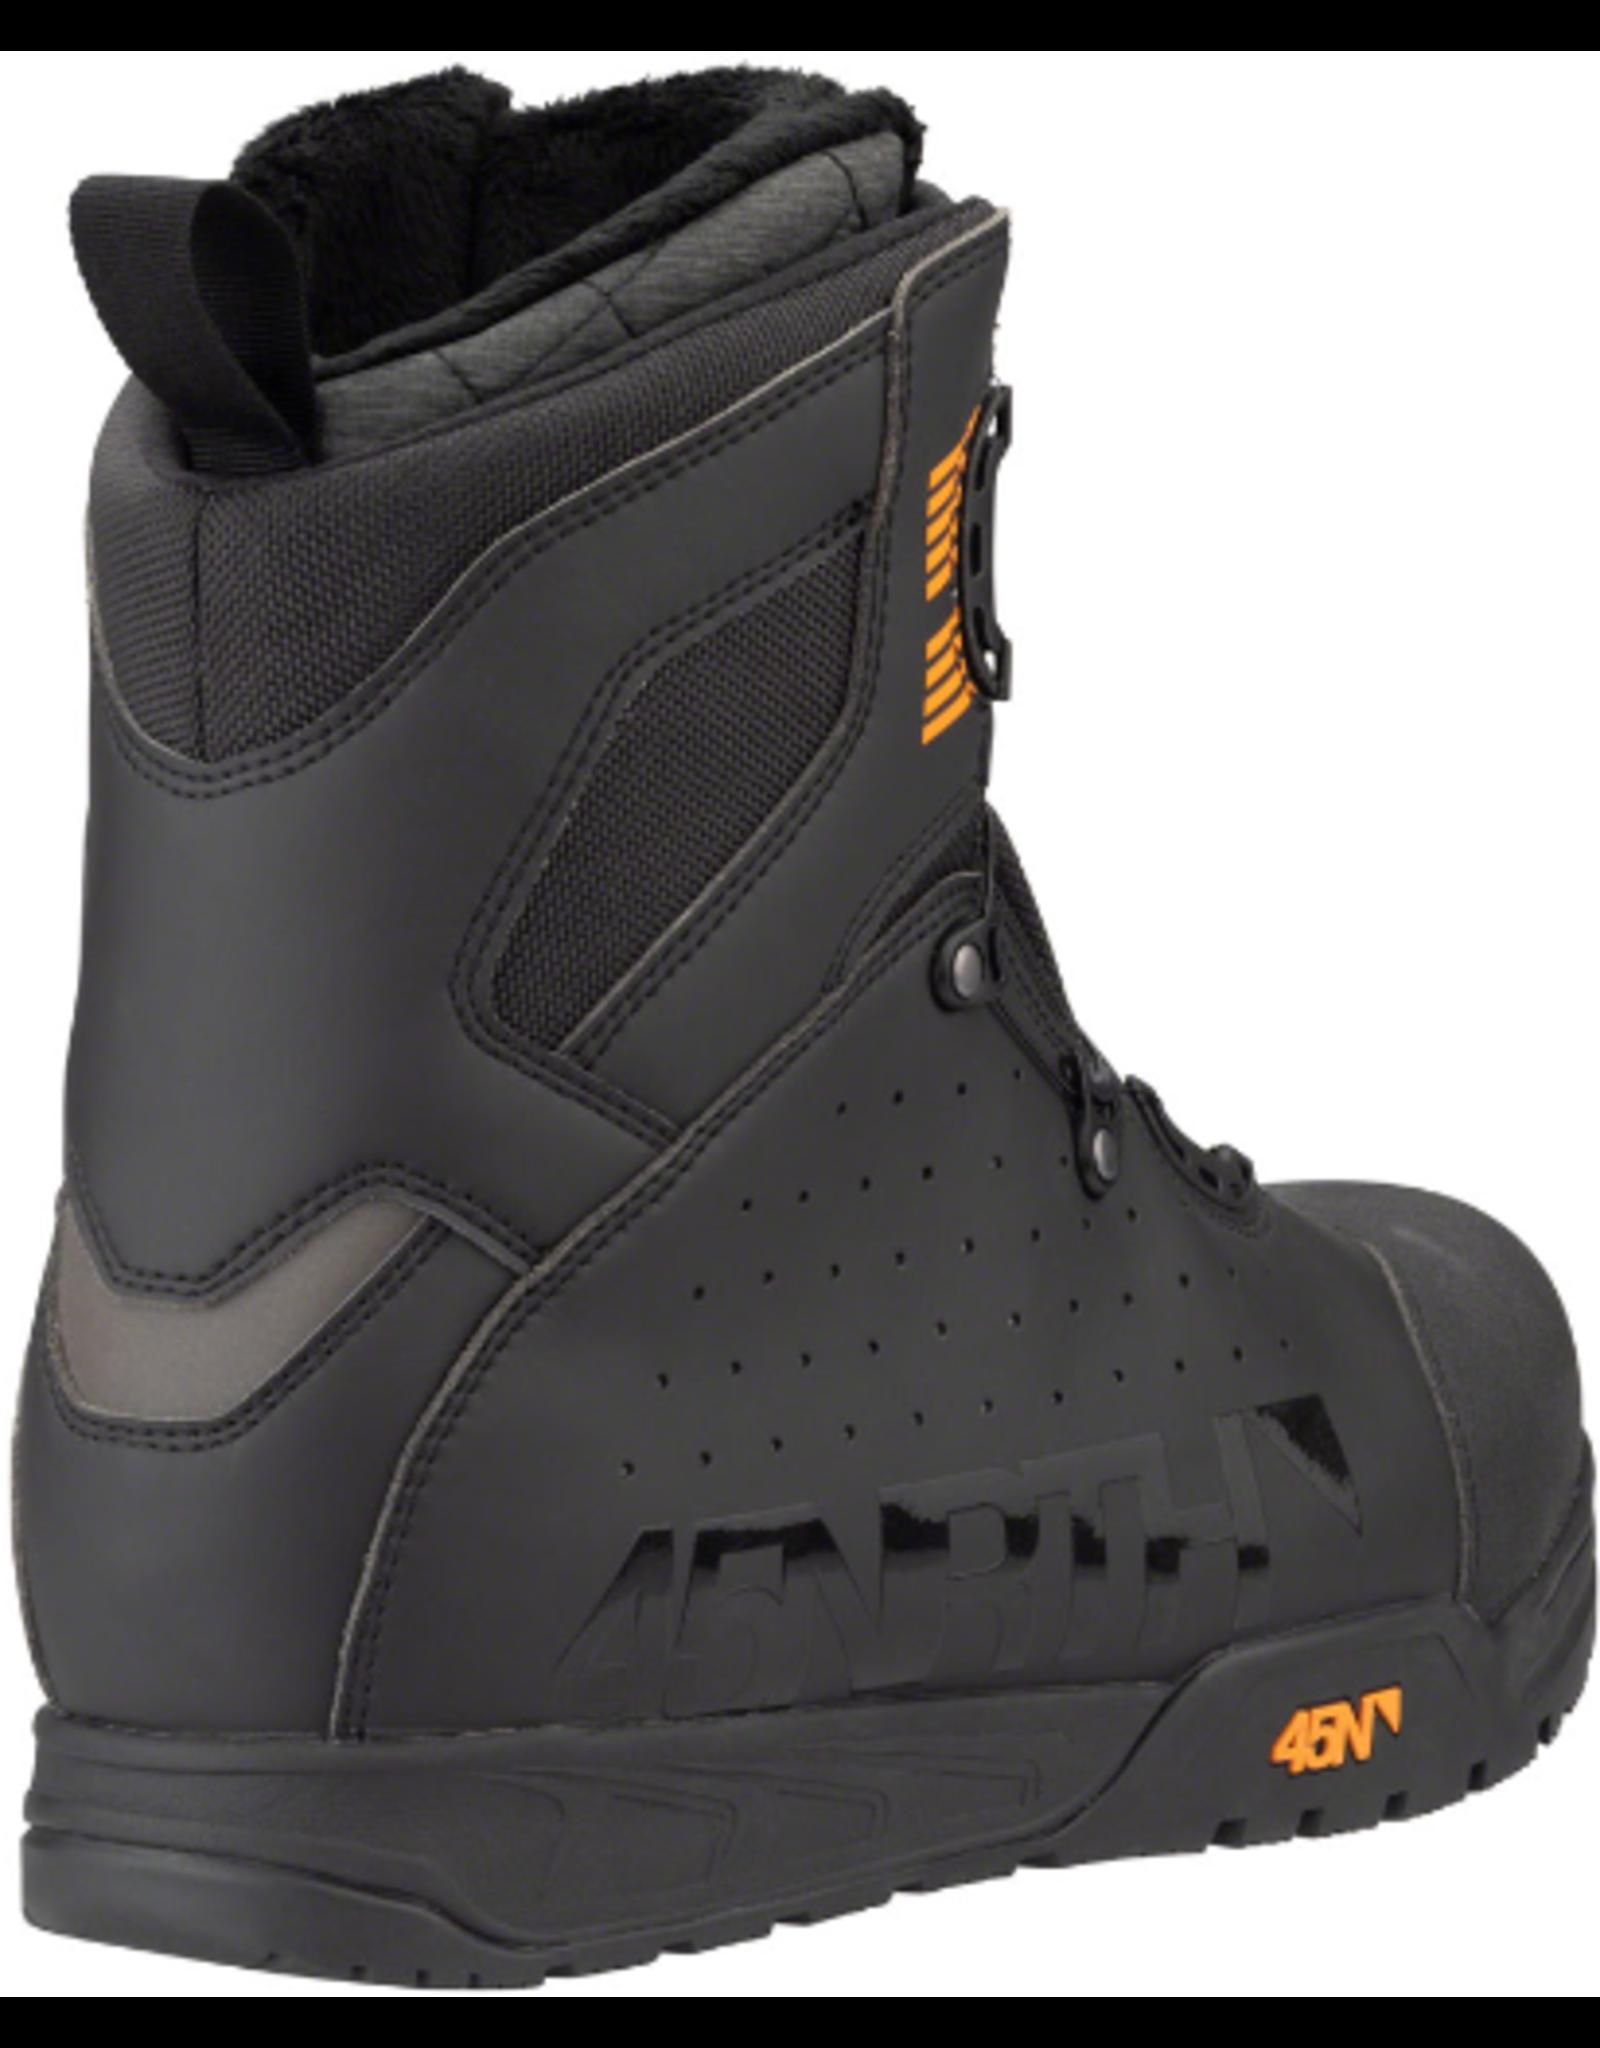 45NRTH 45NRTH Wolvhammer Cycling Boot: BOA Closure, Black, Size 44